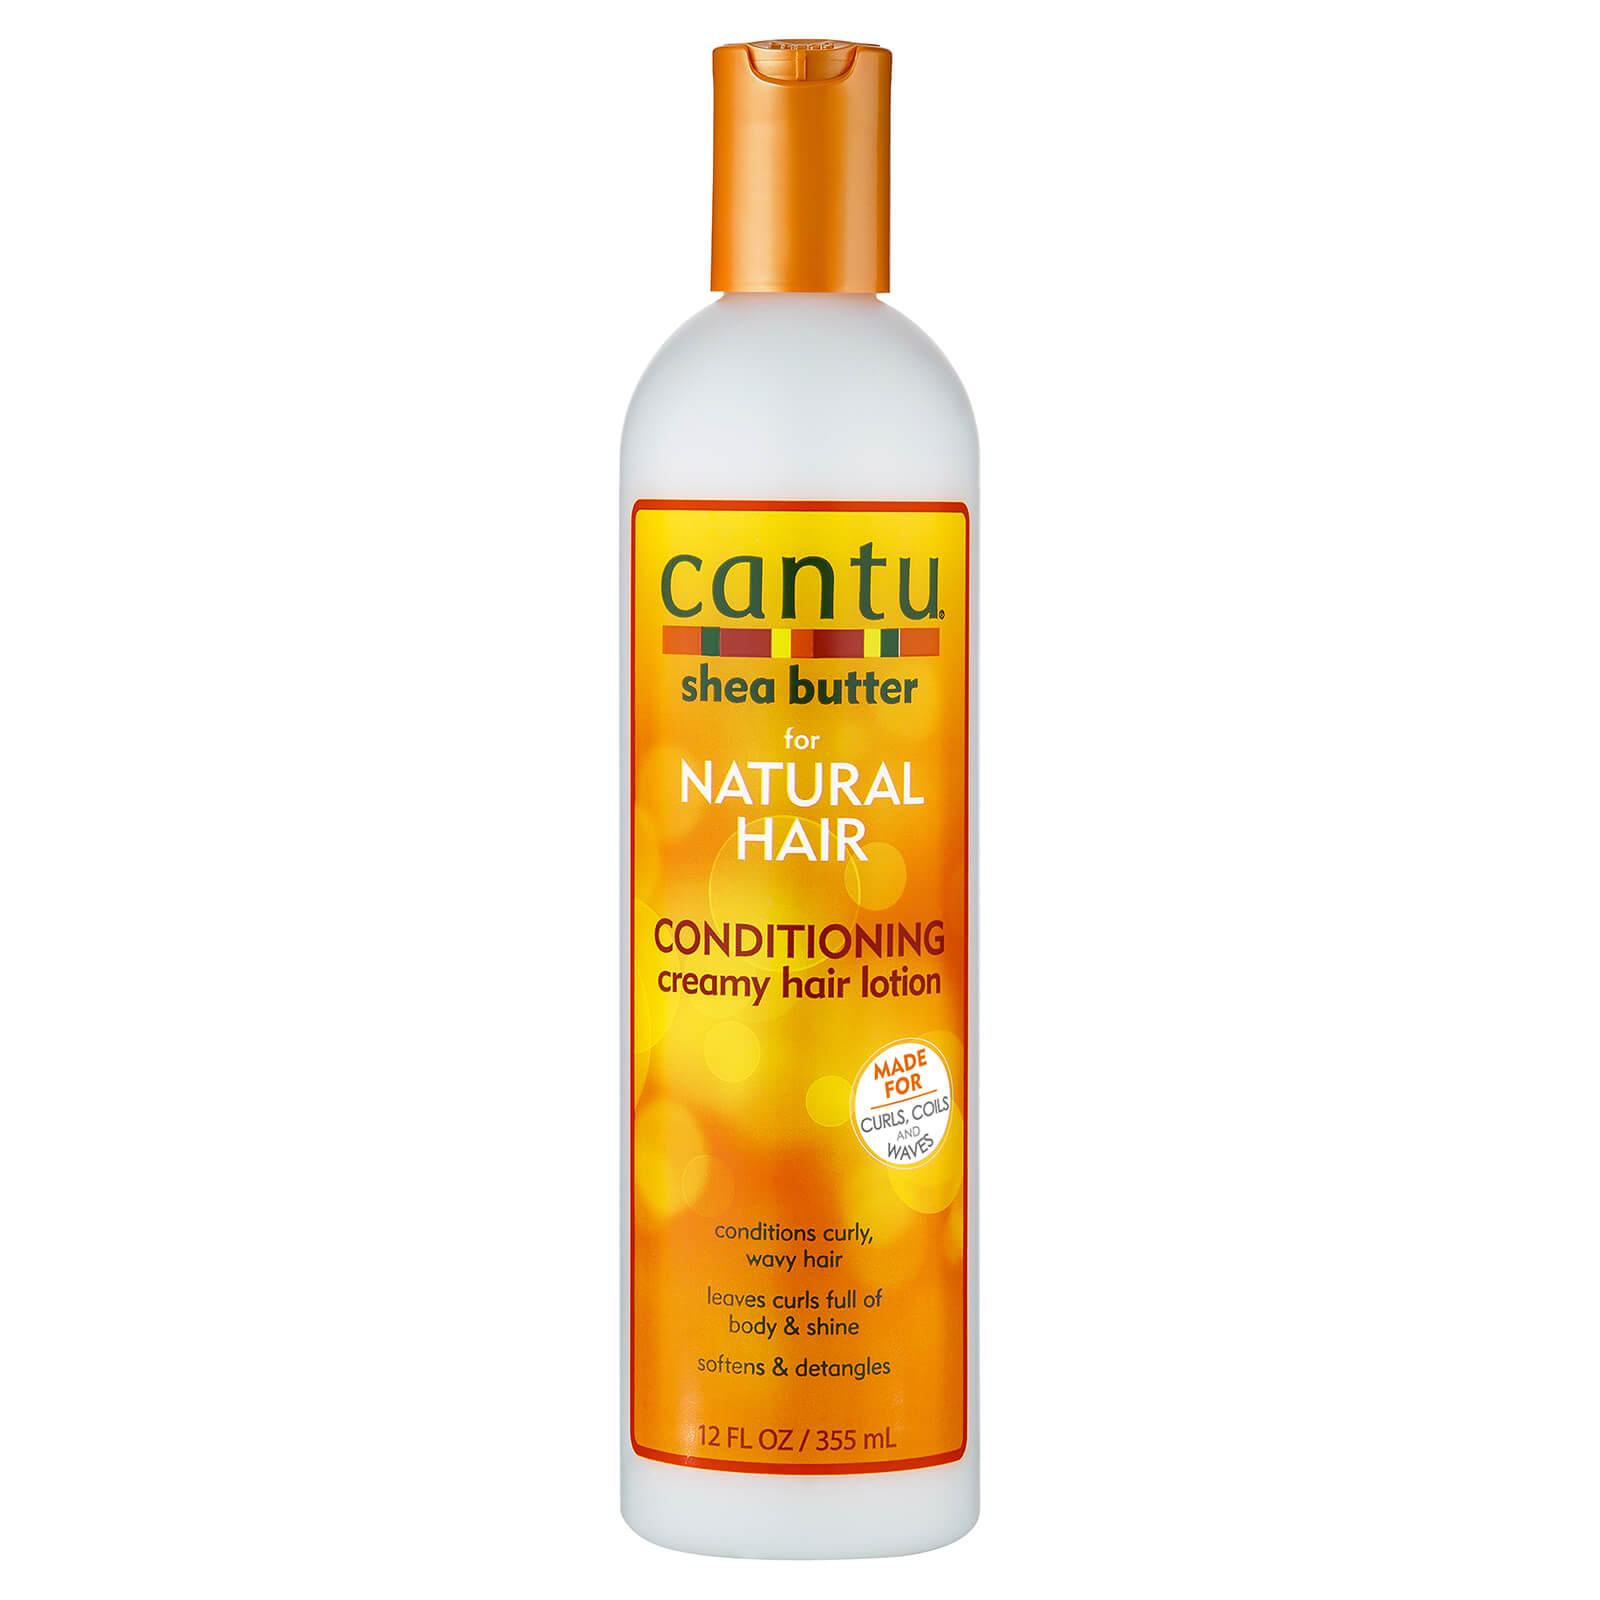 Купить Cantu Conditioning Creamy Hair Lotion 355g